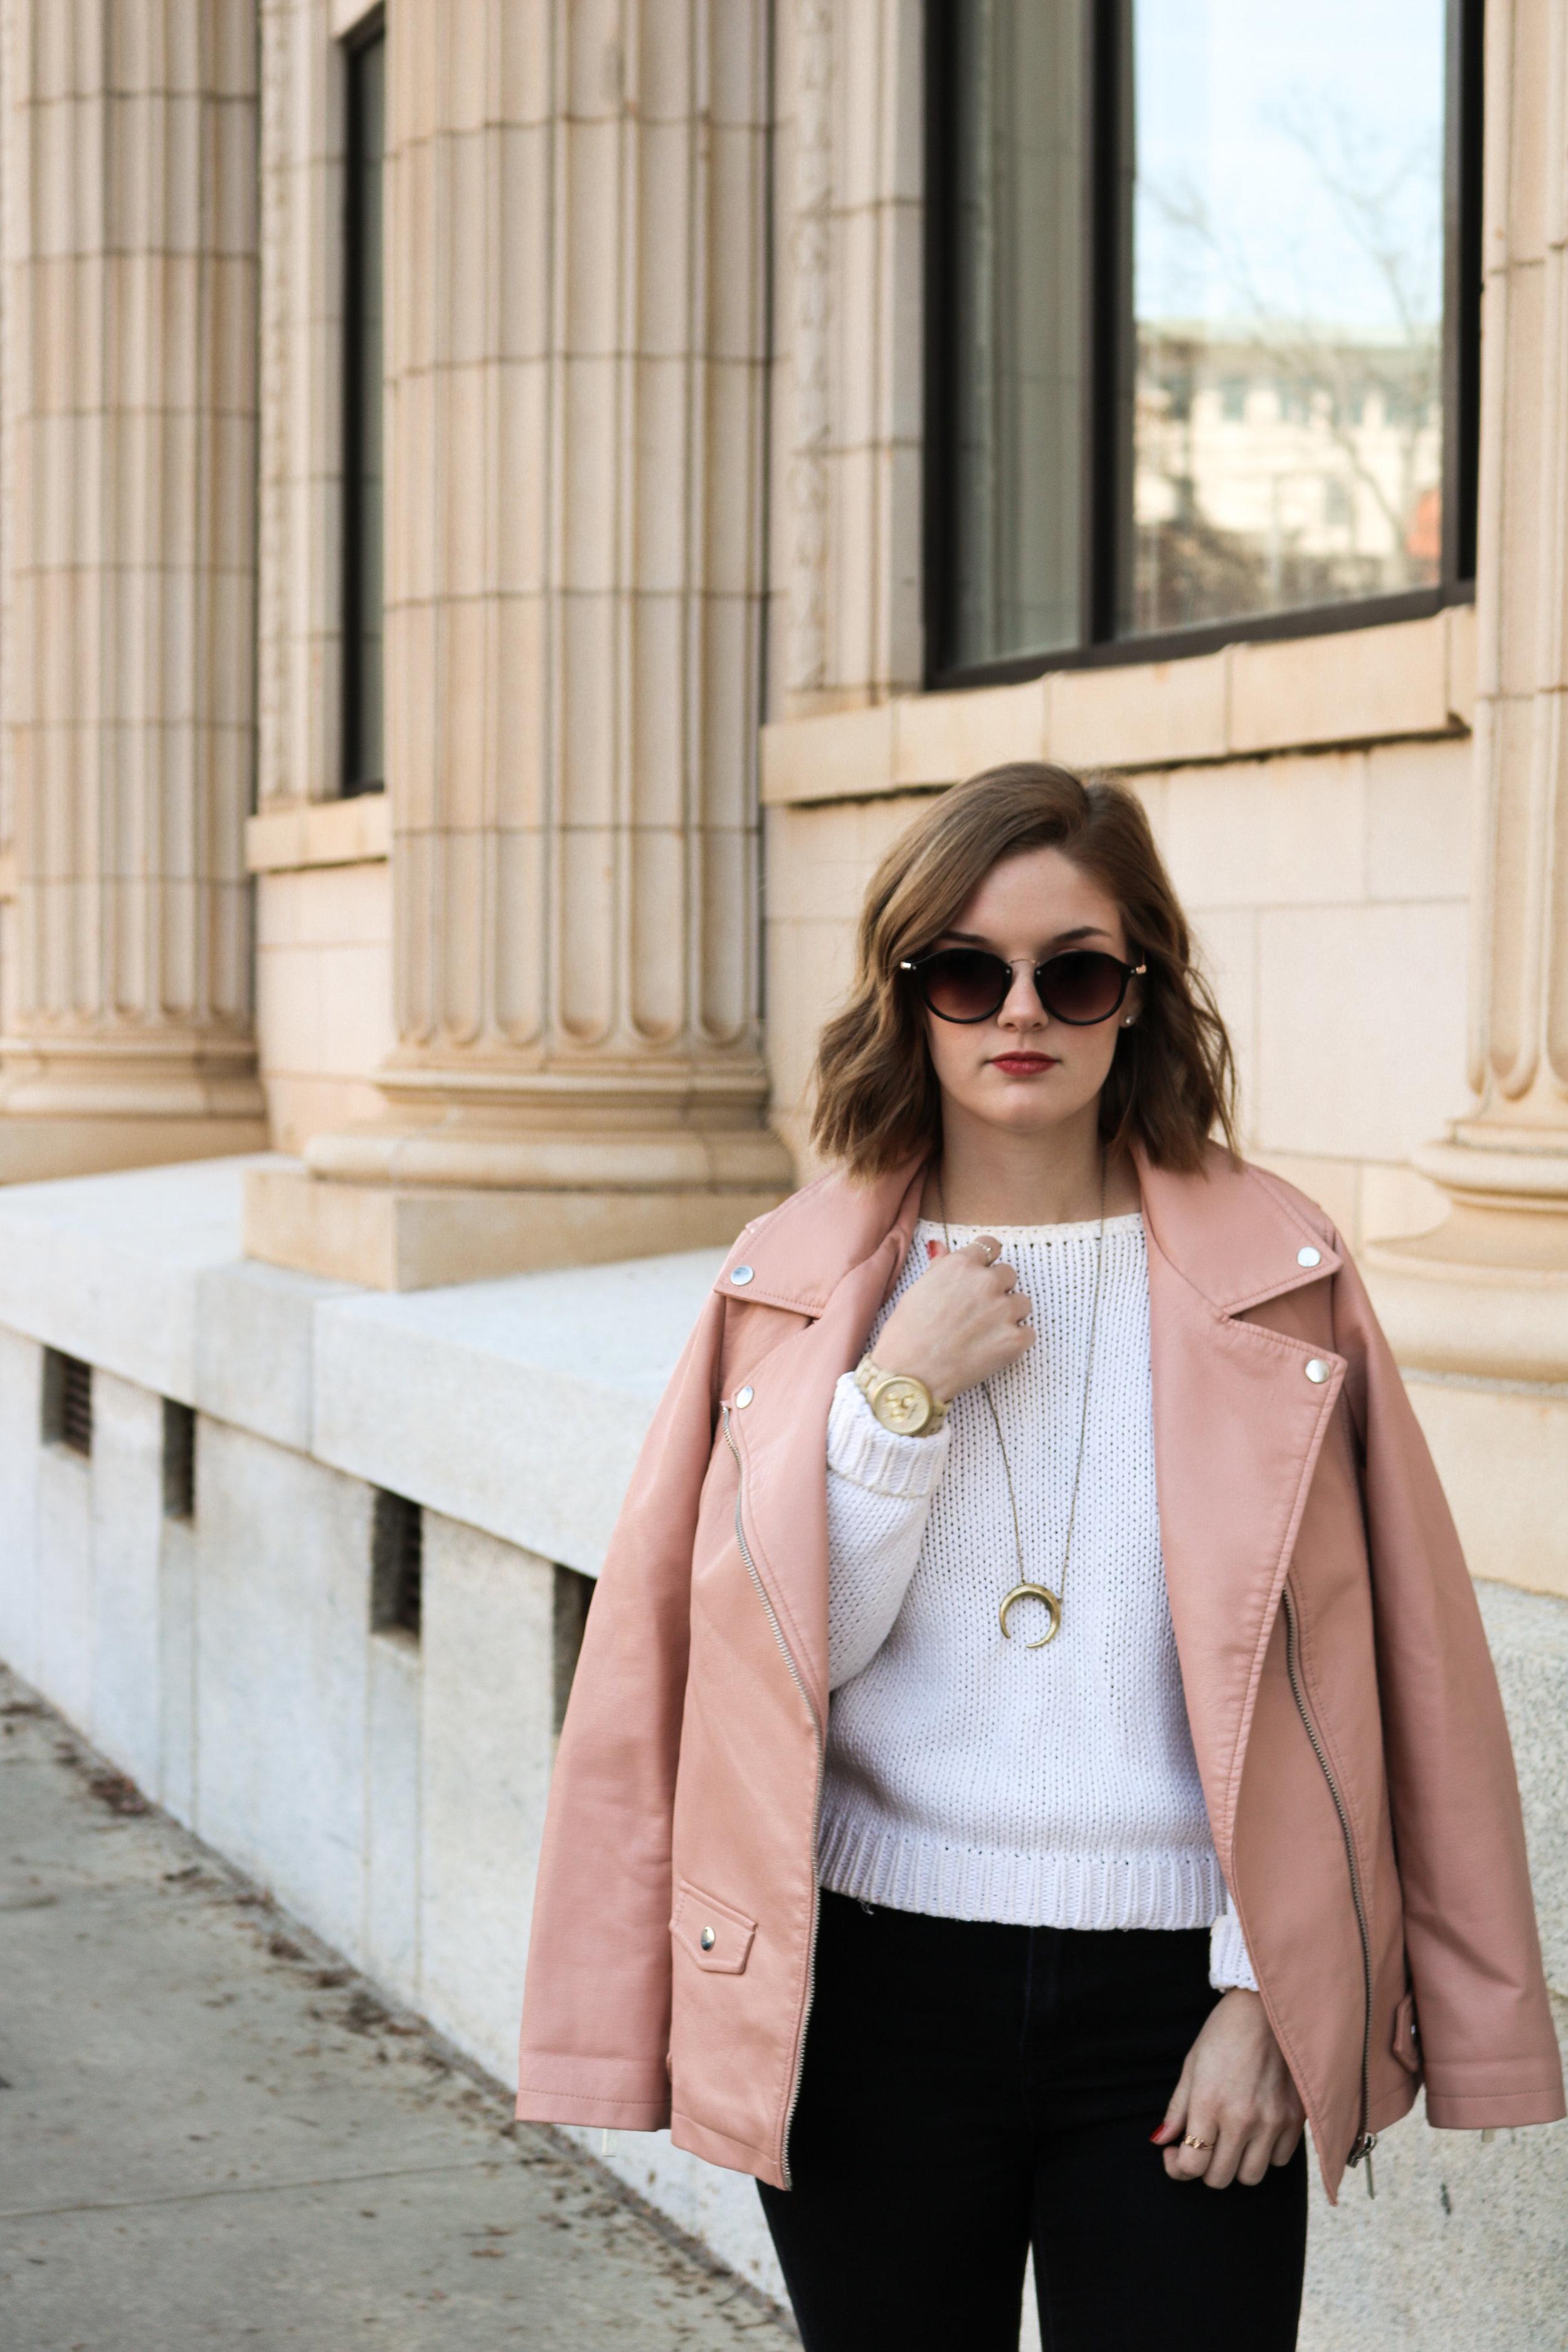 pinkjacket-fpsweater-4.jpg